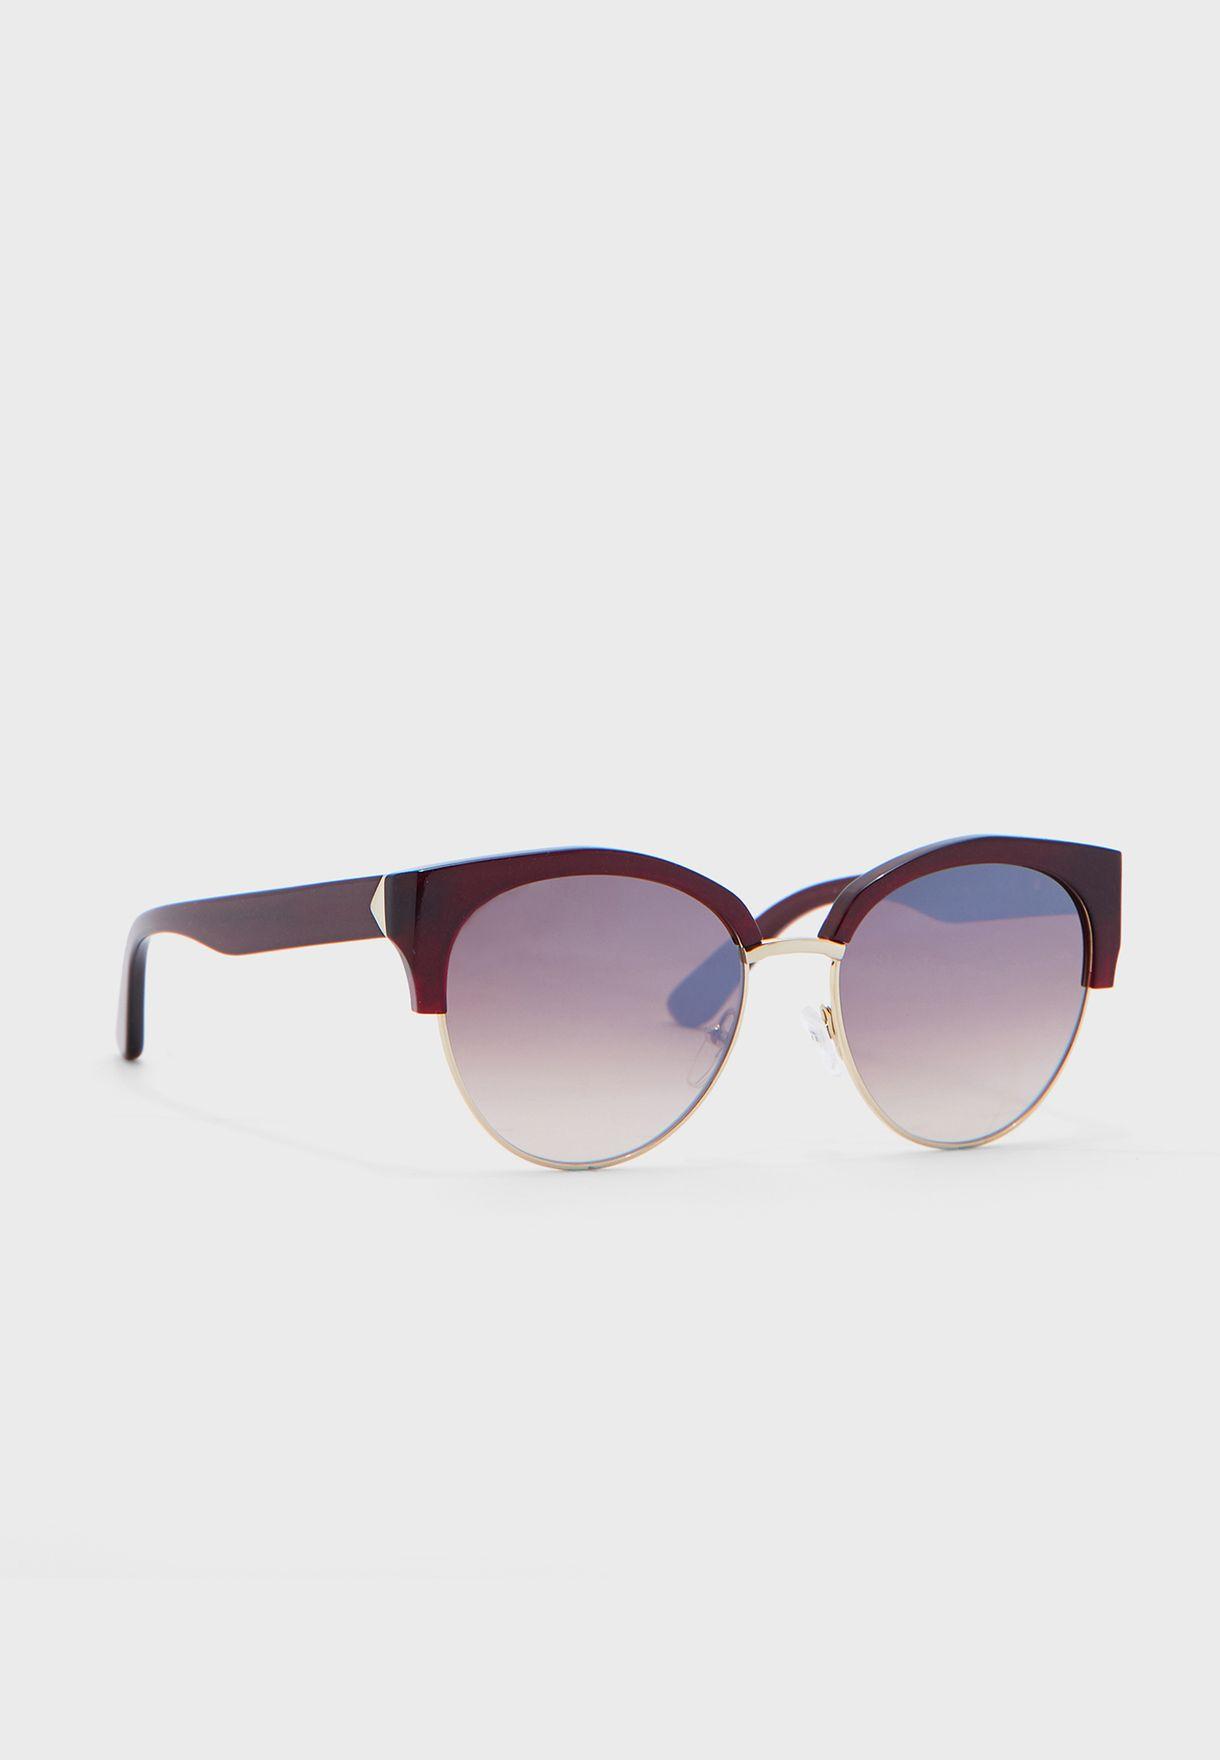 Kl270S Oval Shape Sunglasses